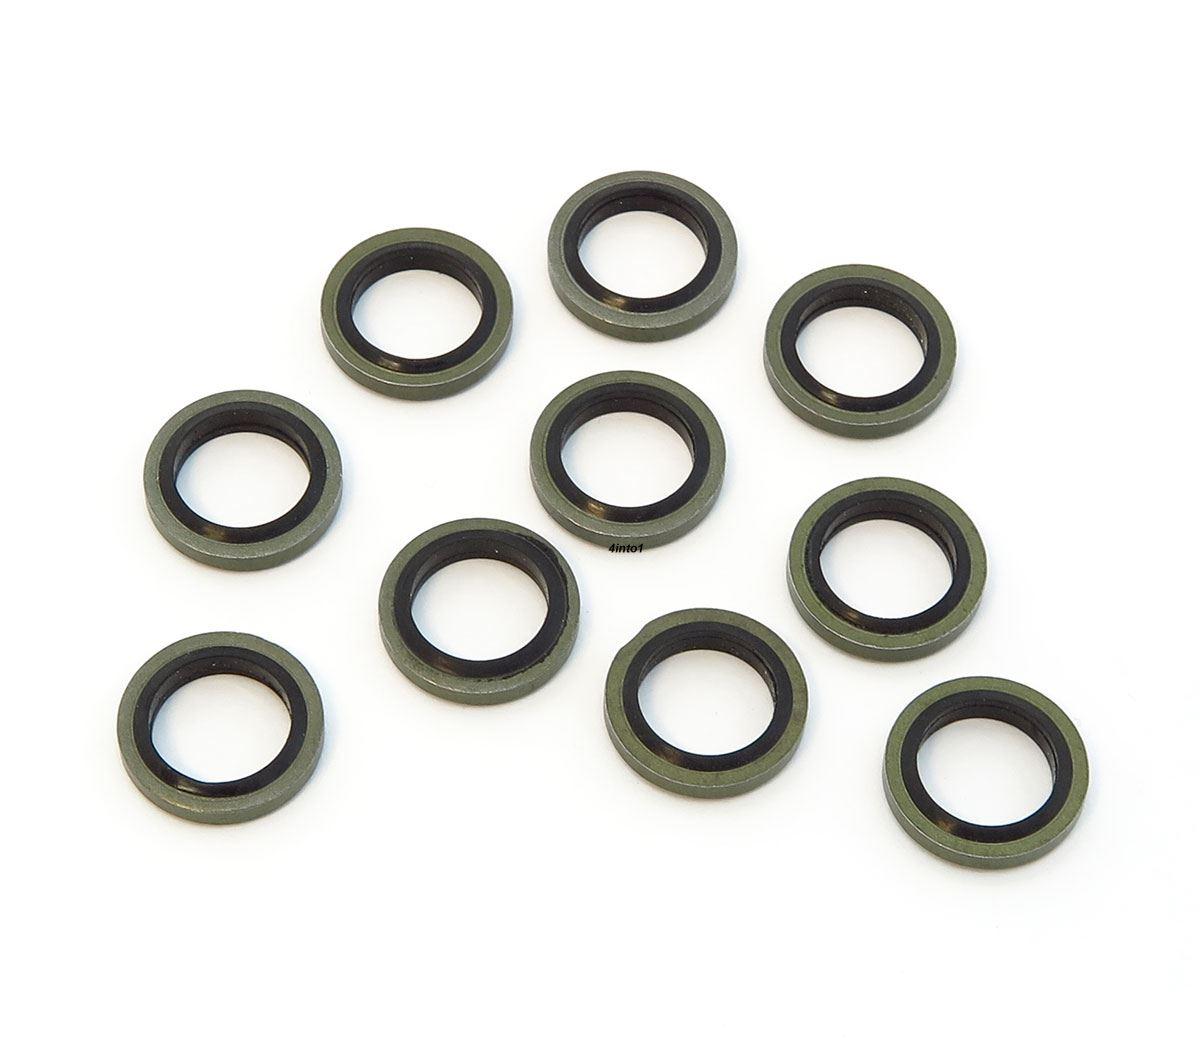 Details about Brake Fitting Banjo Bolt Sealing Washers 3/8